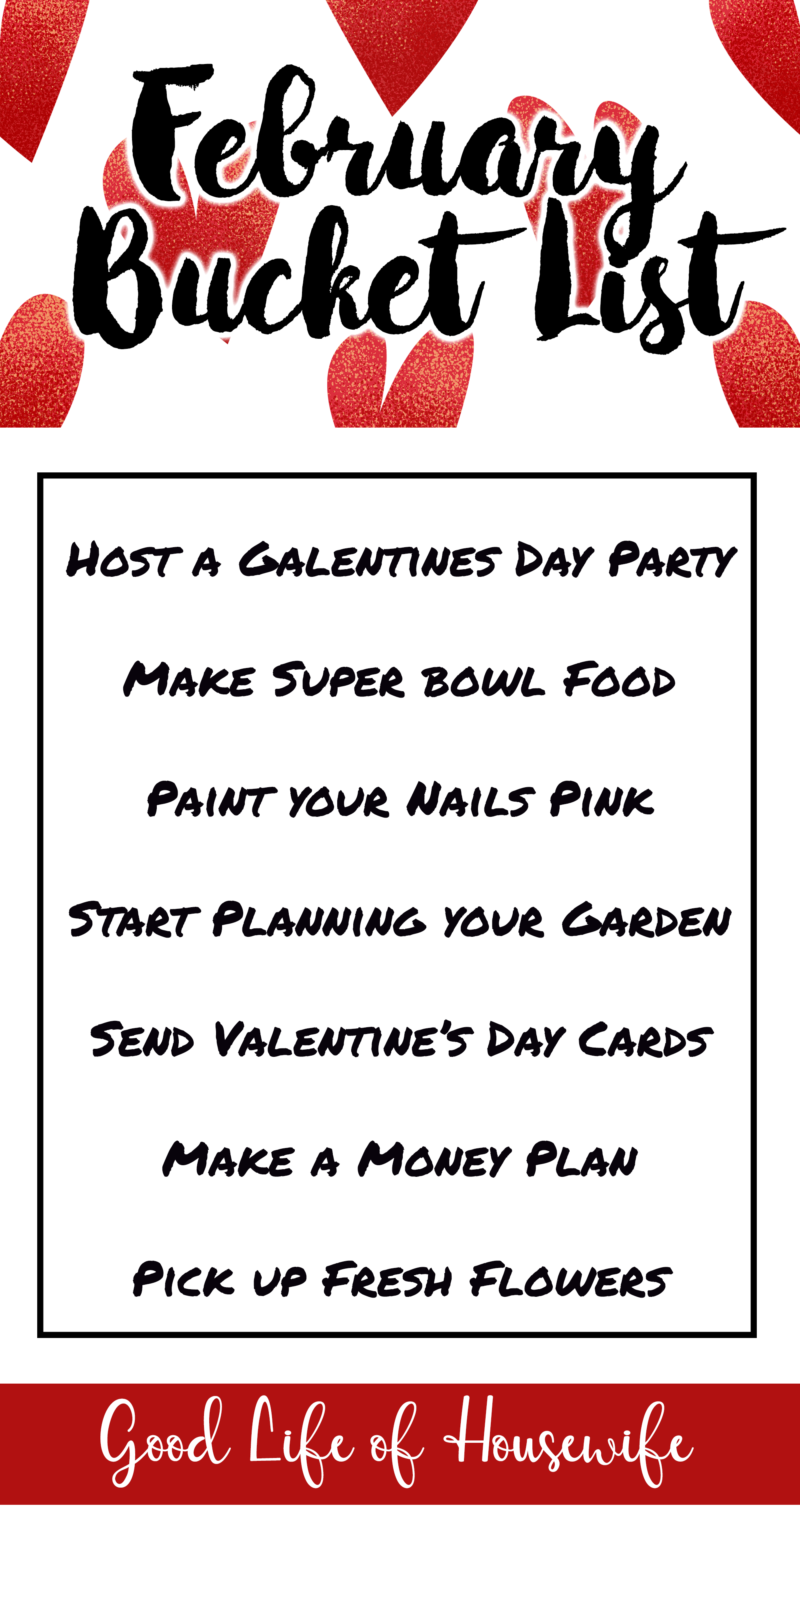 February Bucket List #February #februarybucketlist #valentine'sday